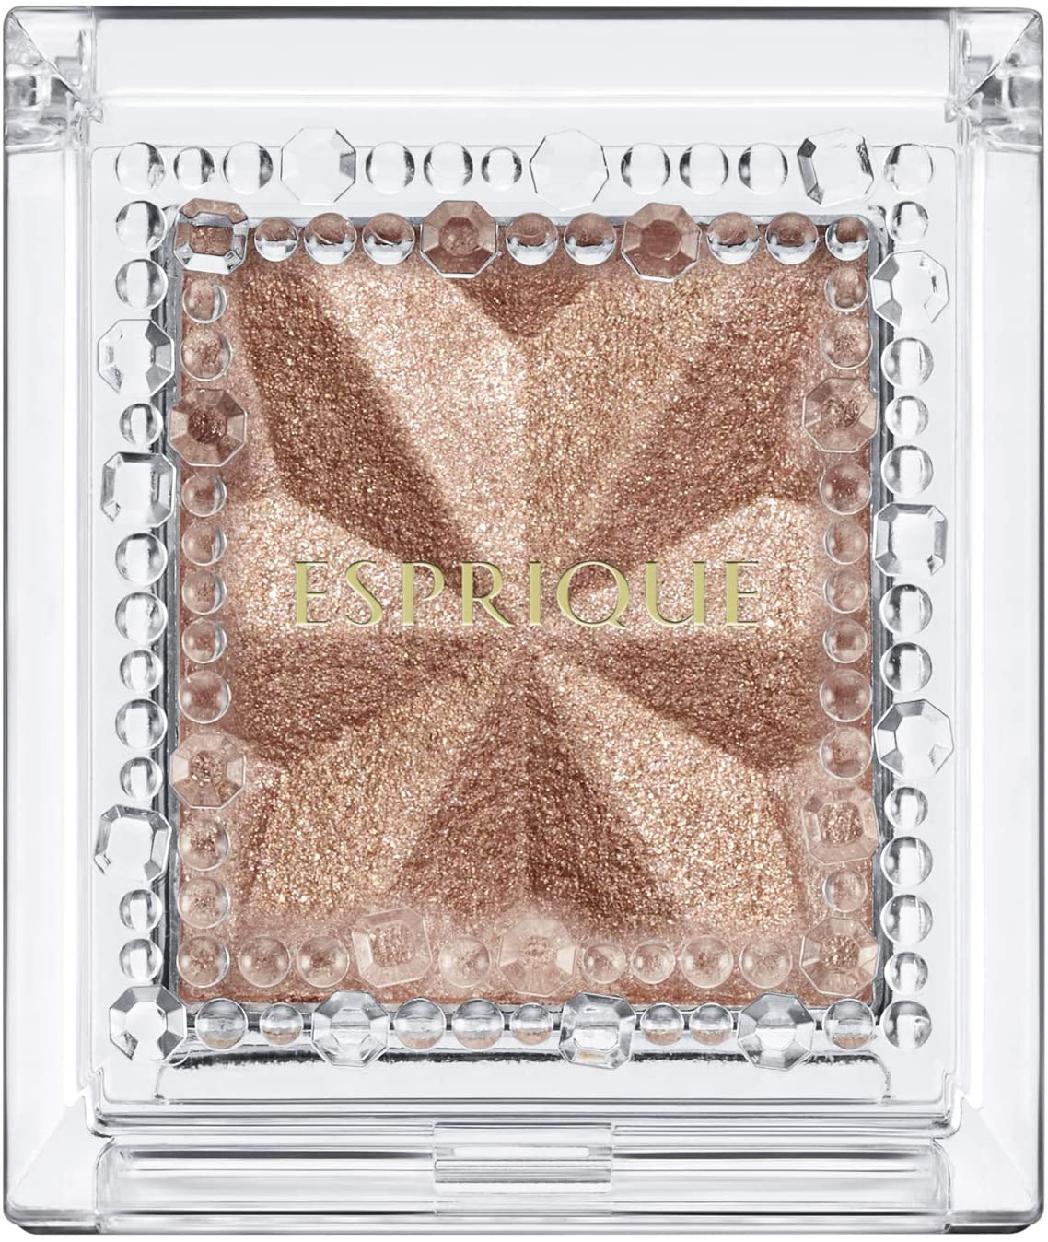 ESPRIQUE(エスプリーク)セレクト アイカラー Nの商品画像